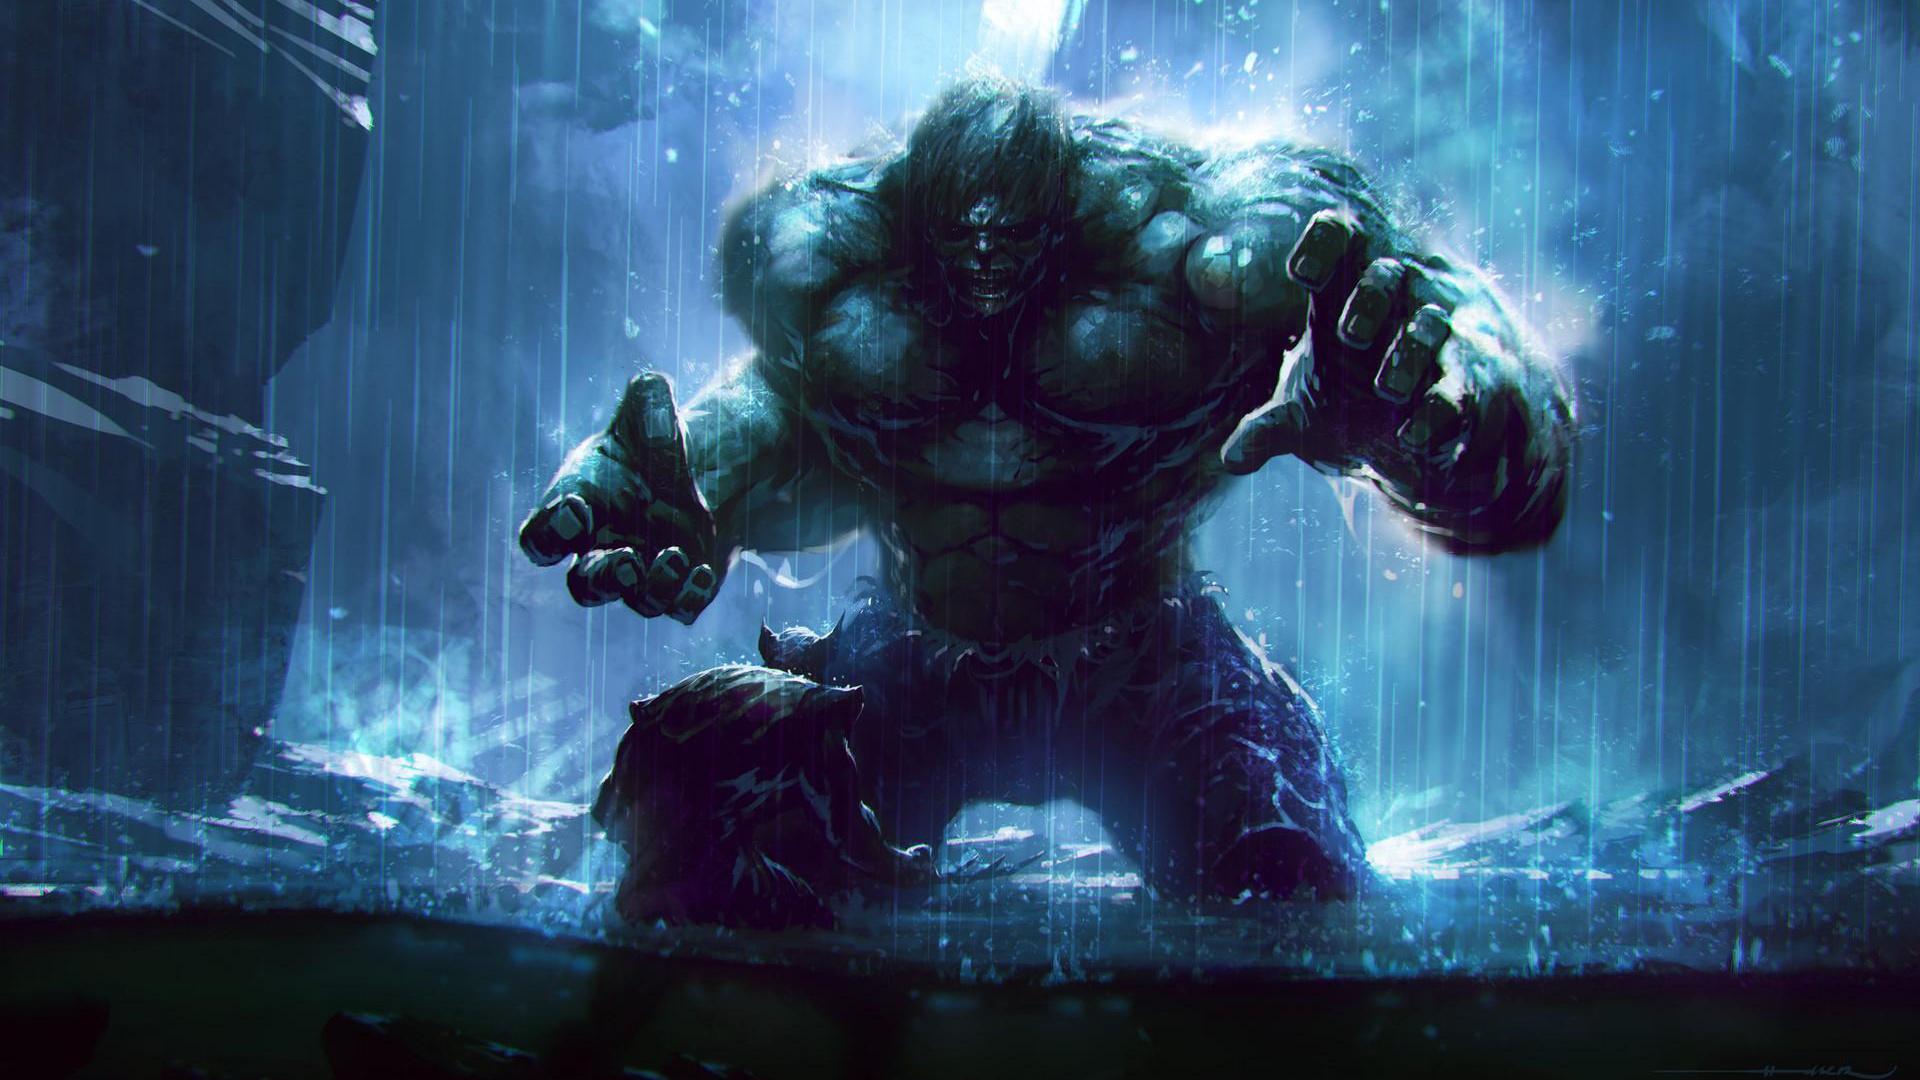 Hulk free photo